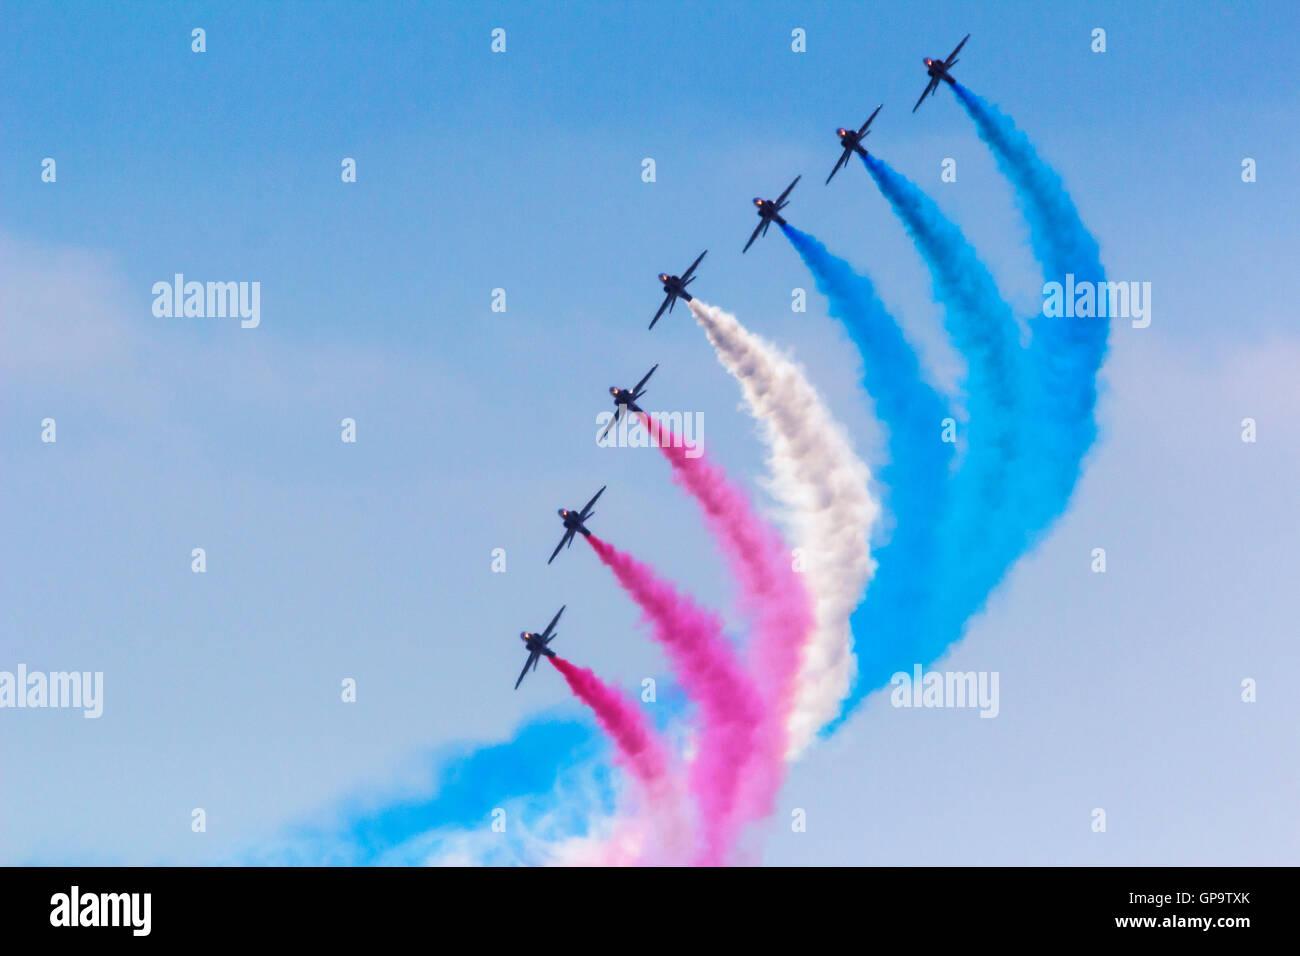 Red Arrows RAF Aerobatics Display Team at Eastbourne International Airshow Airbourne 2016 - Stock Image